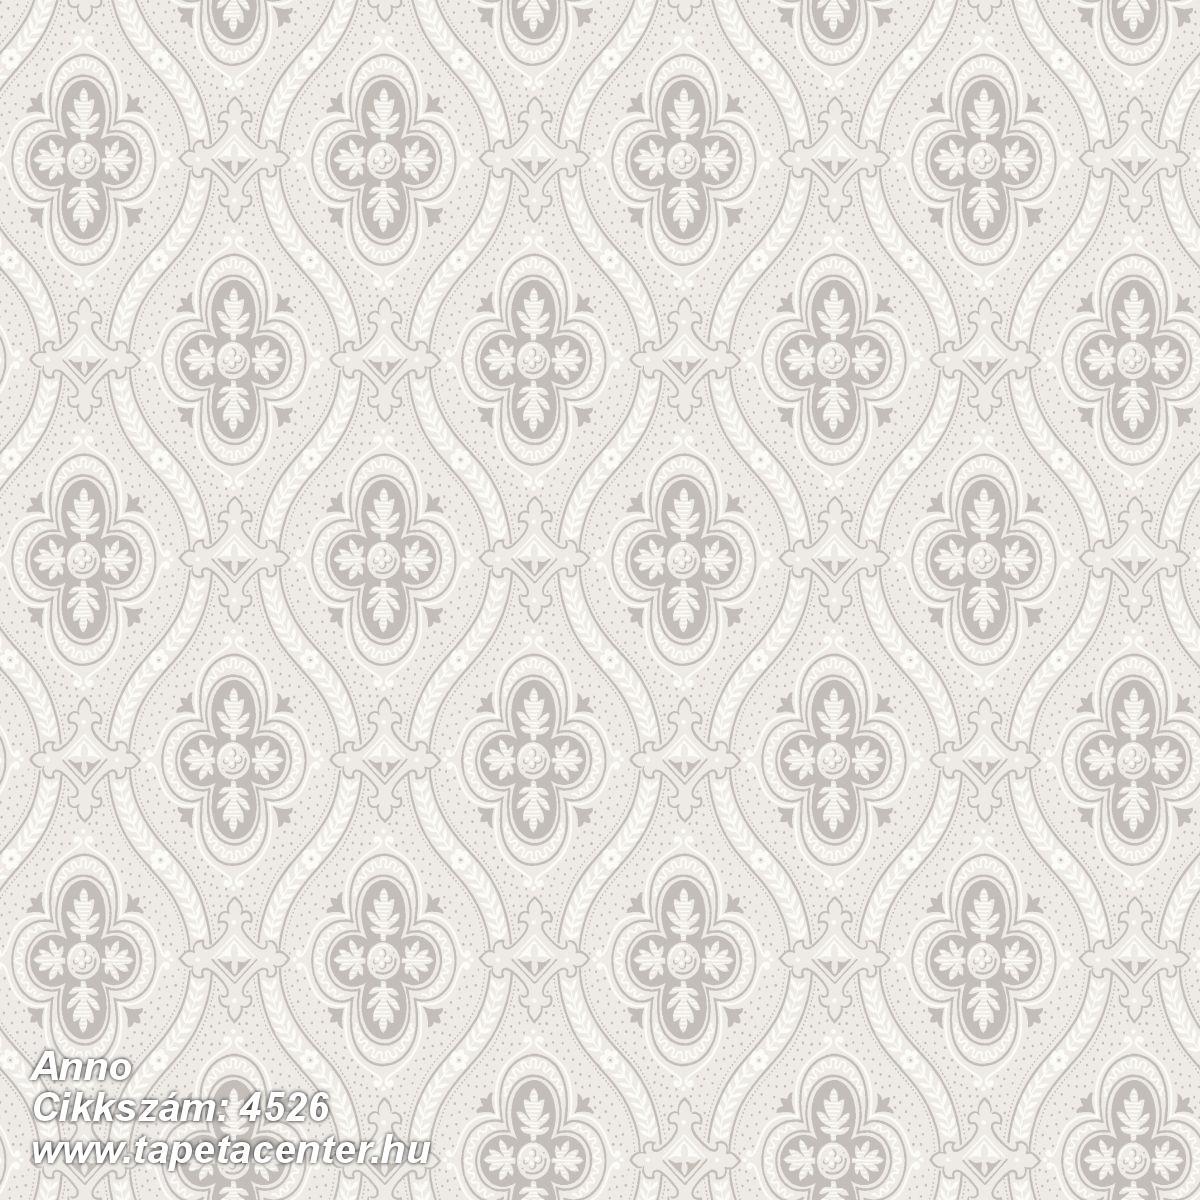 Barokk-klasszikus,bézs-drapp,vajszín,lemosható,vlies tapéta